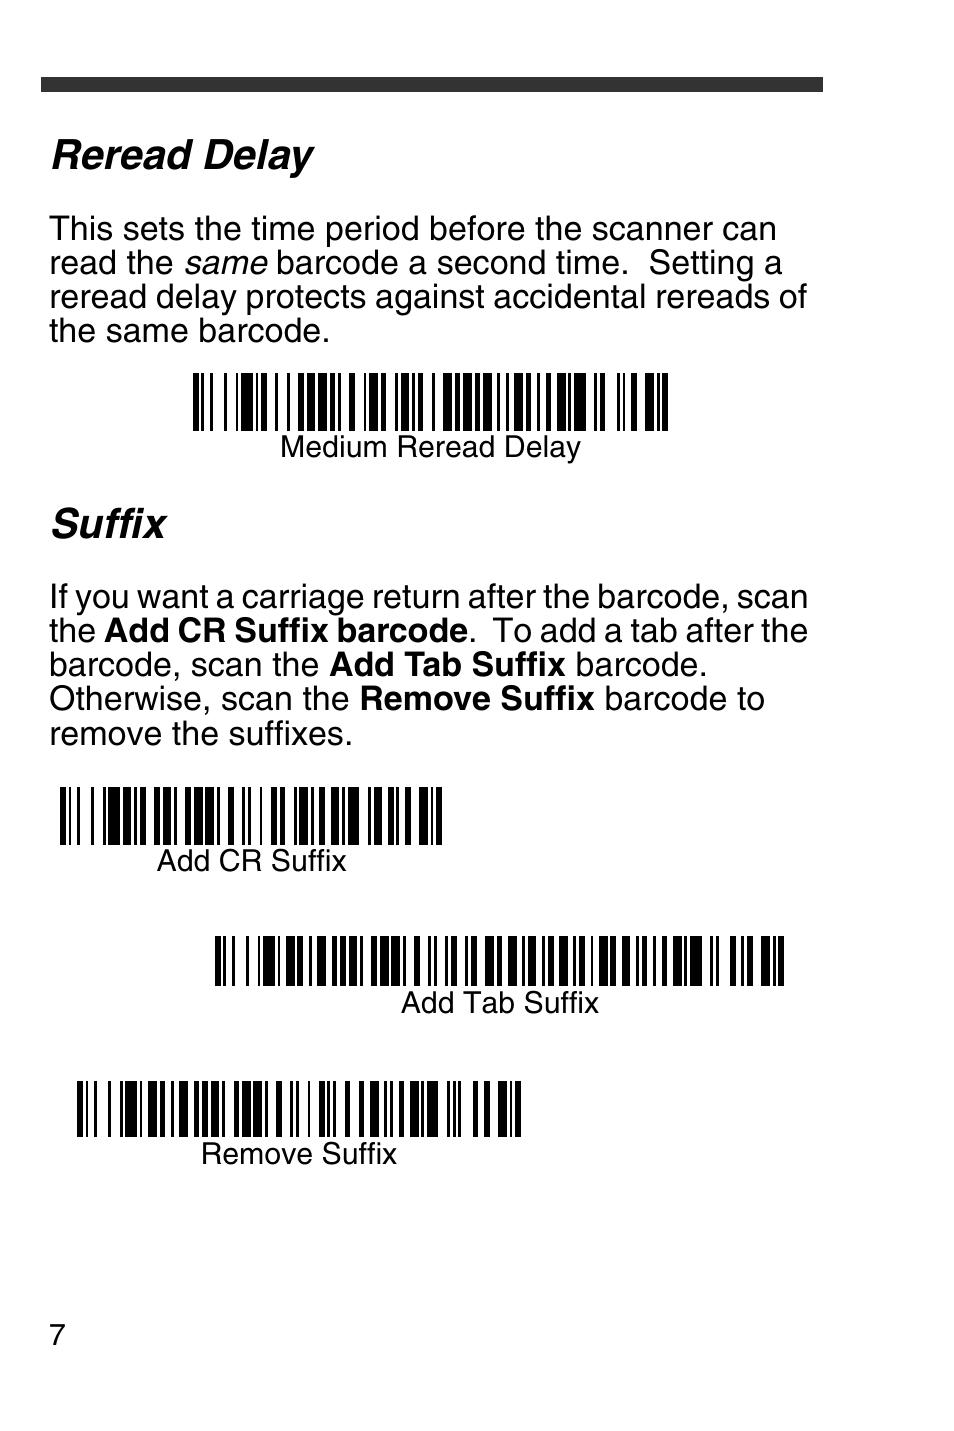 reread delay suffix honeywell 4600g user manual page 8 20 rh manualsdir com honeywell 4600g scanner user manual honeywell barcode scanner 4600g manual